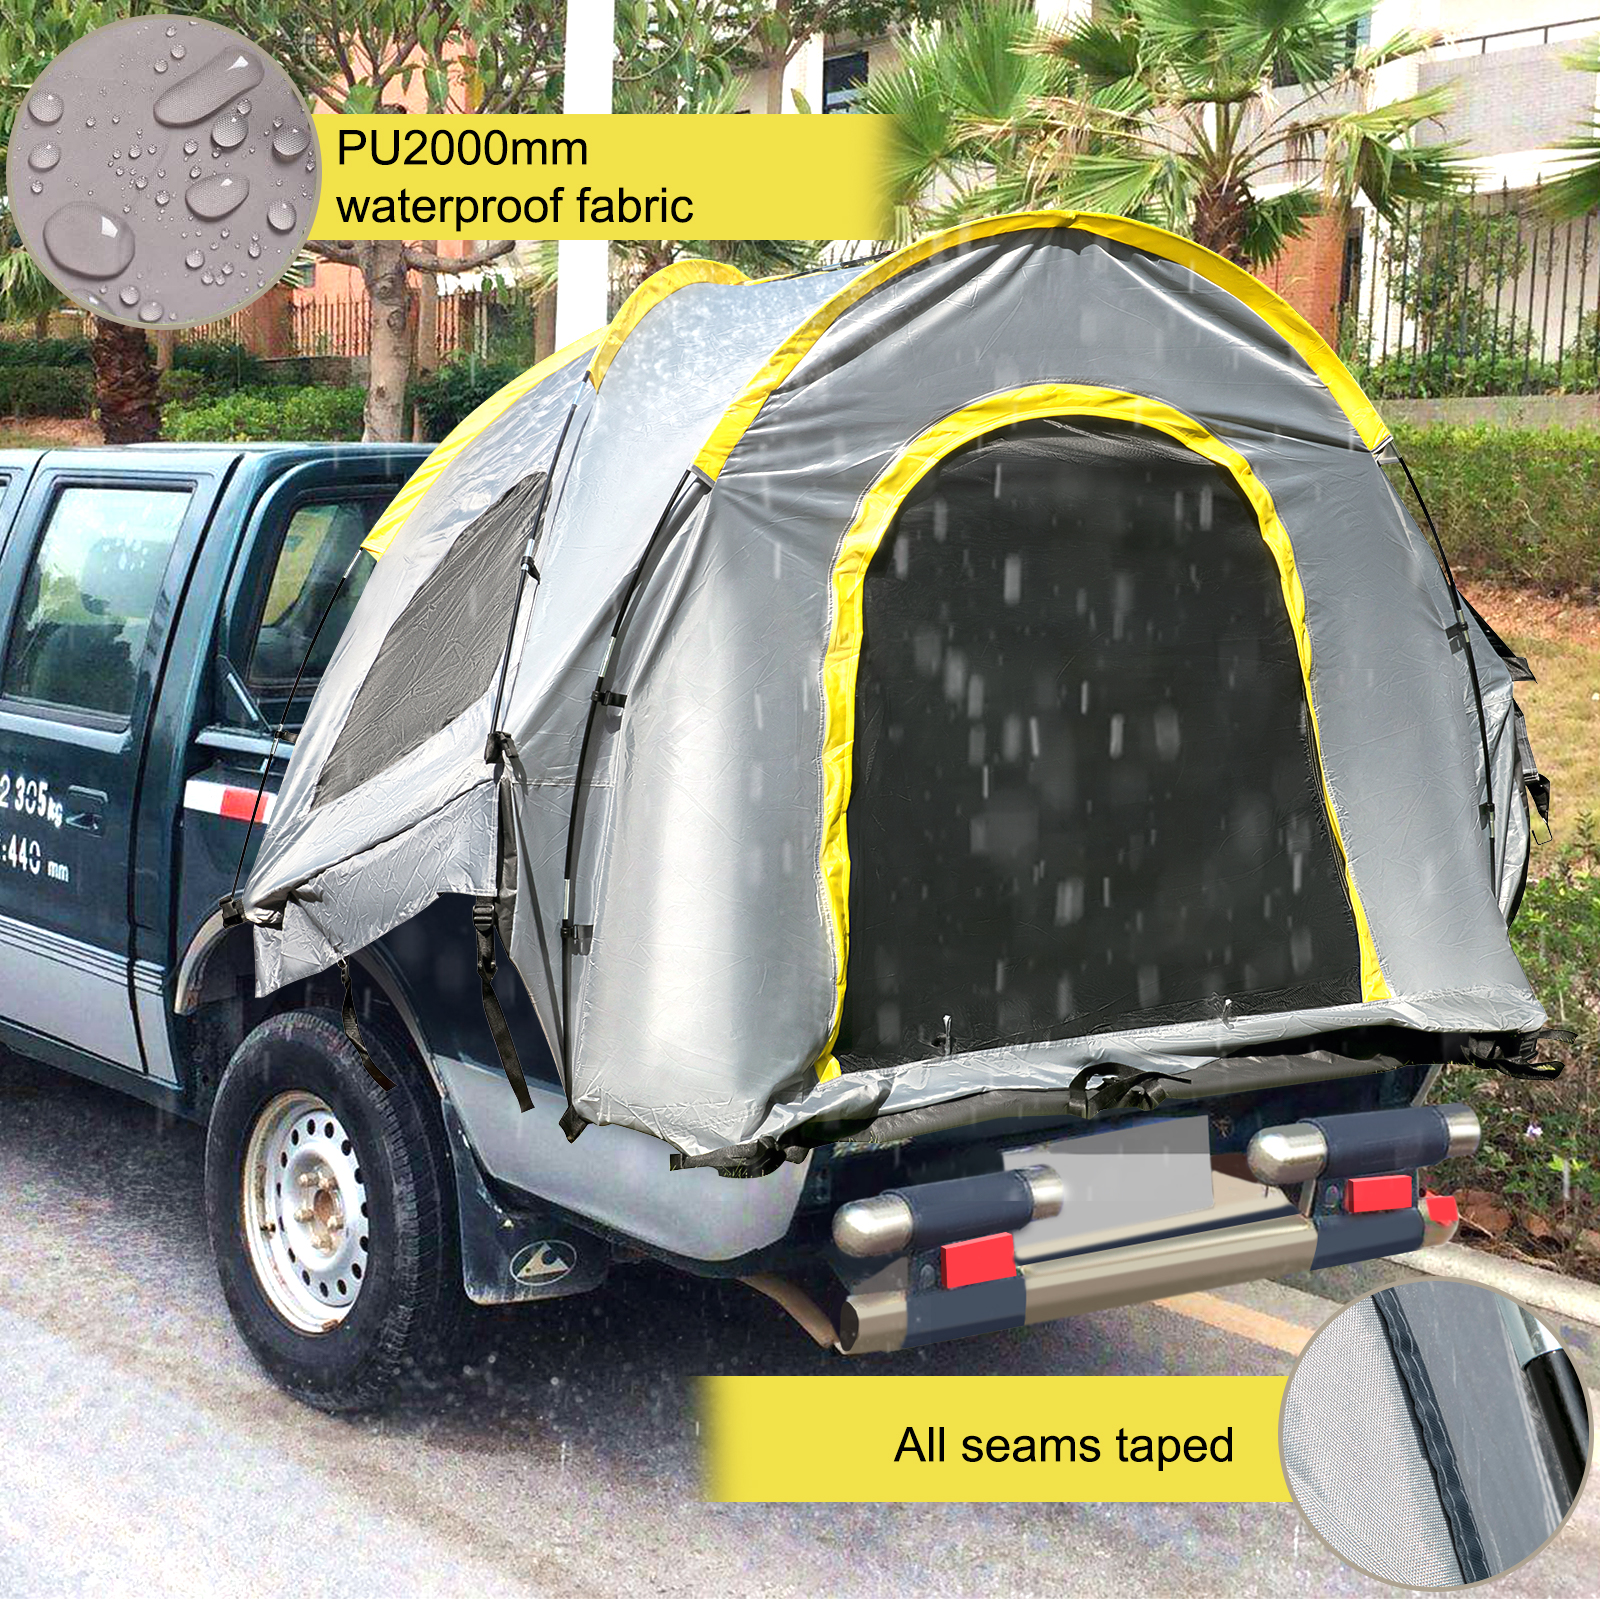 thumbnail 4 - VEVOR Truck Tent Truck Bed Tent 5' - 8' Pickup Tent Waterproof Outdoor Camping